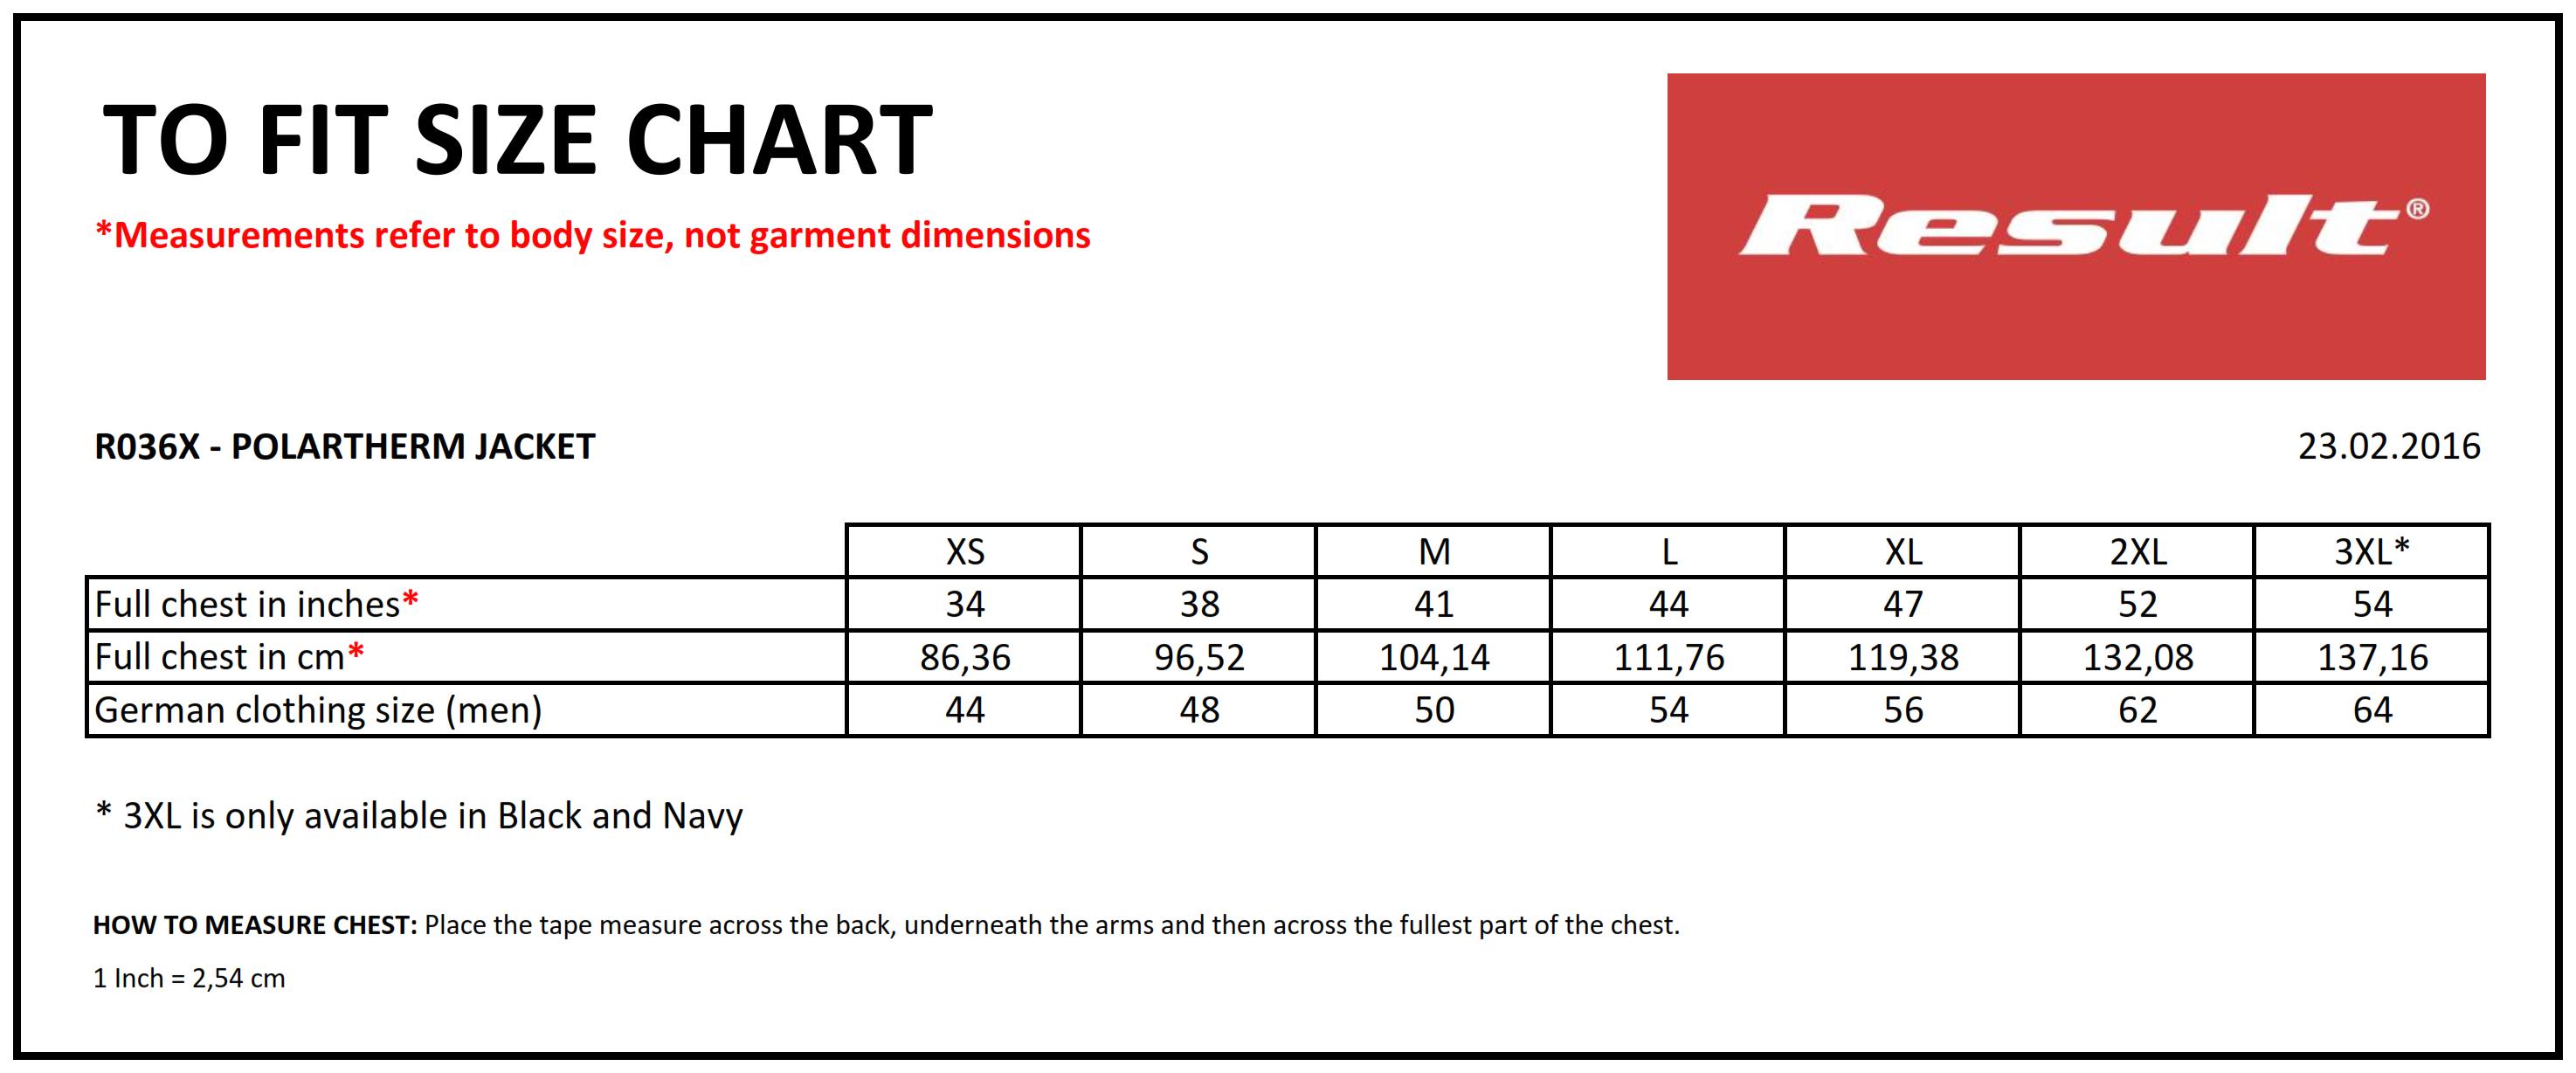 Result: Heavyweight Polartherm Jacket R036X